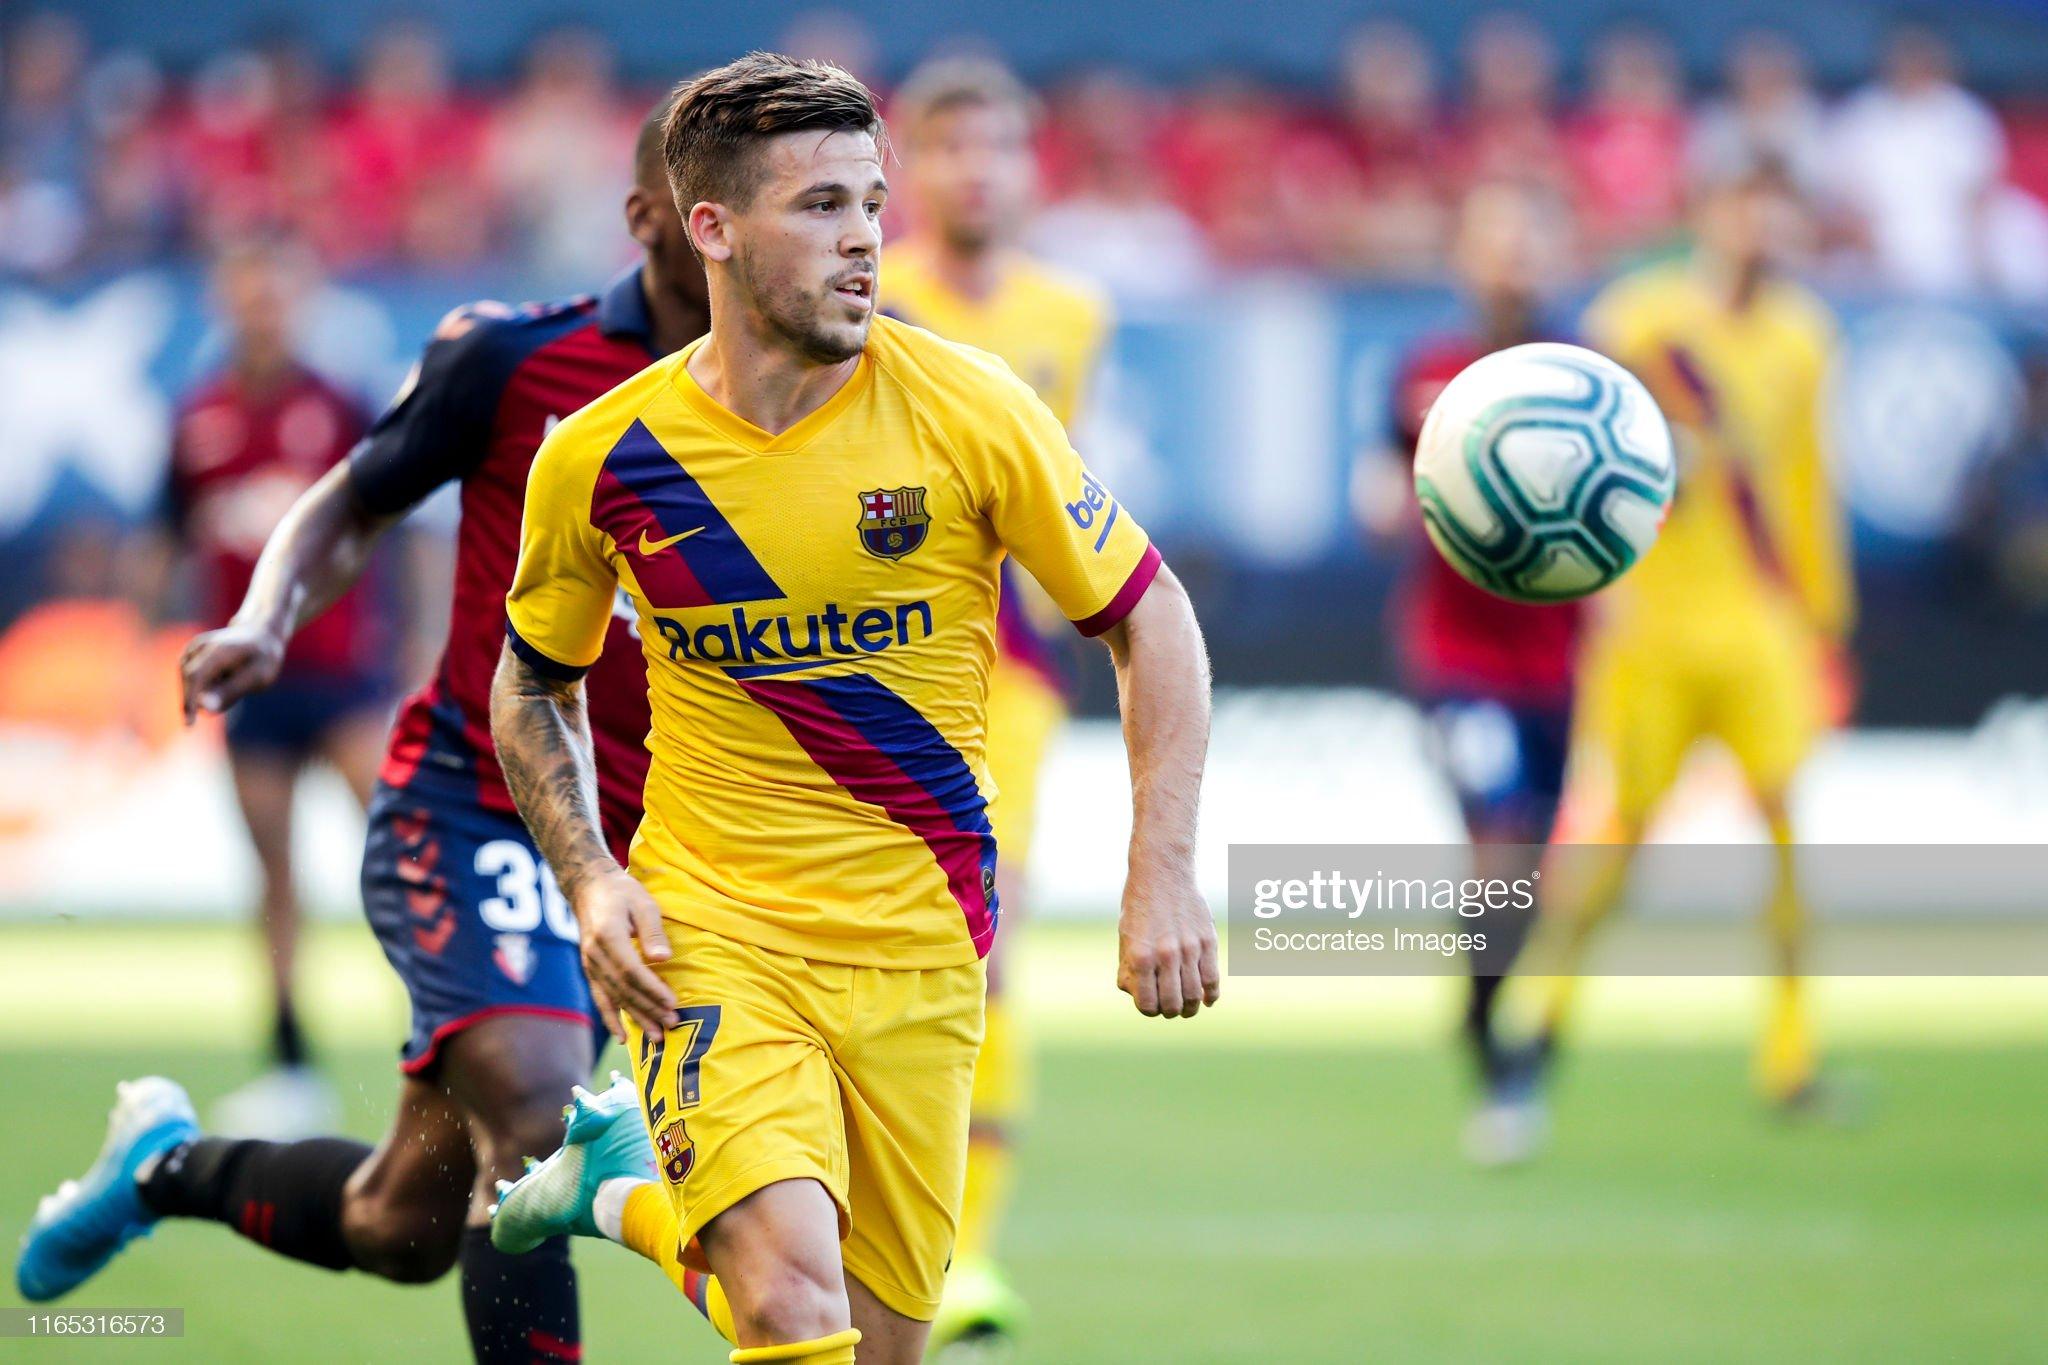 صور مباراة : أوساسونا - برشلونة 2-2 ( 31-08-2019 )  Carles-perez-of-fc-barcelona-during-the-la-liga-santander-match-v-picture-id1165316573?s=2048x2048